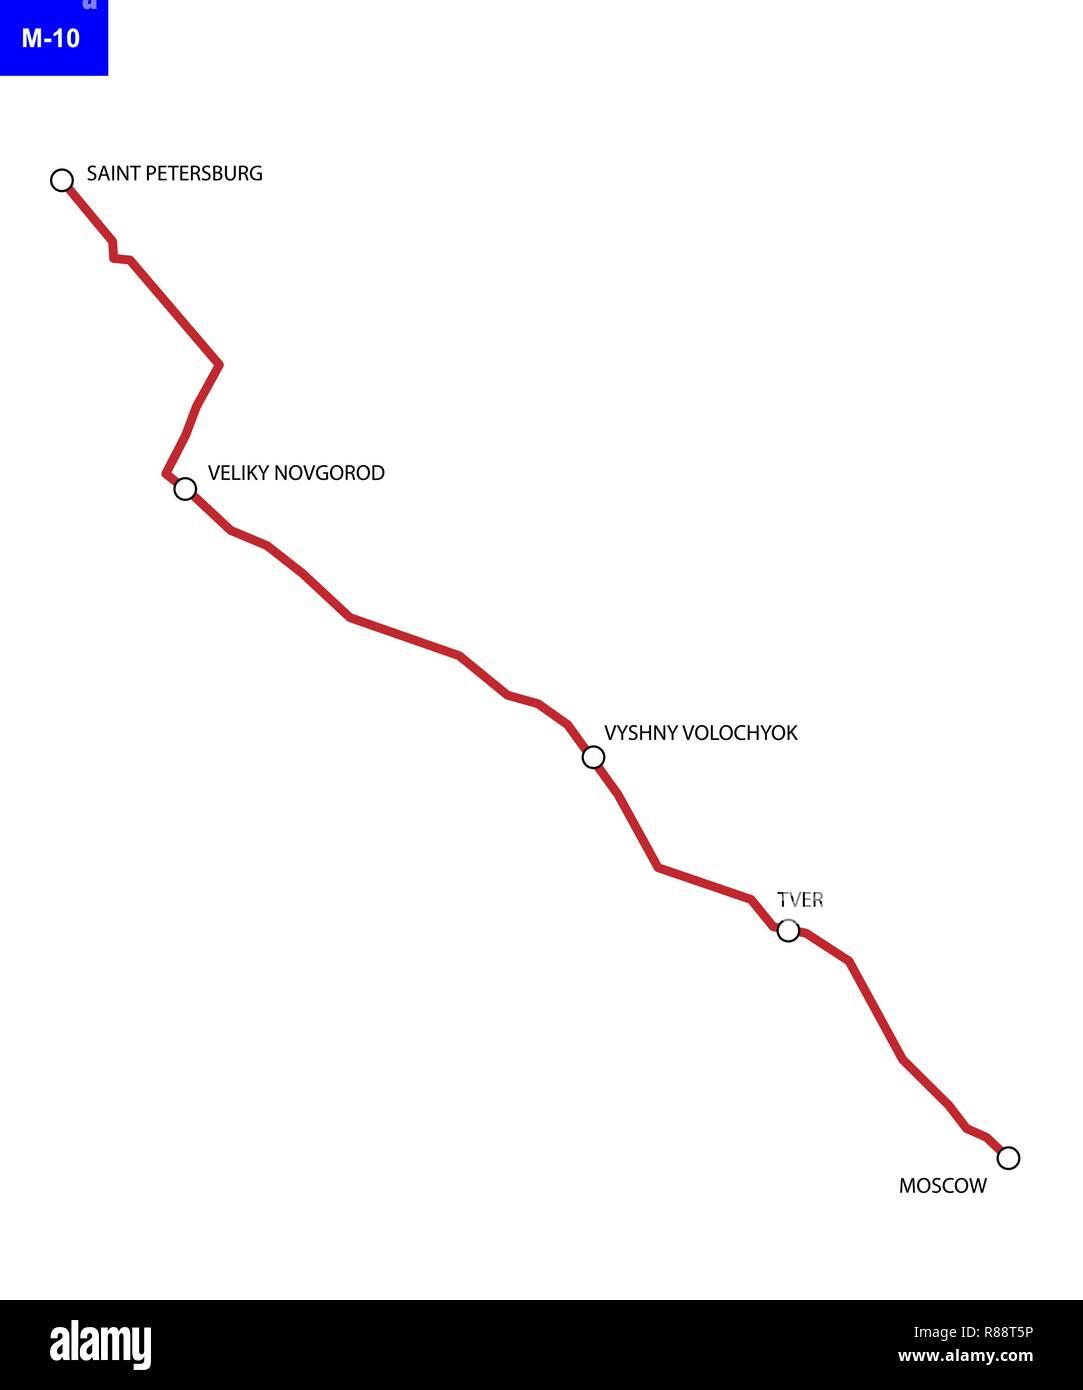 Federacion De Ruta M 10 De Rusia La Autopista Moscu San